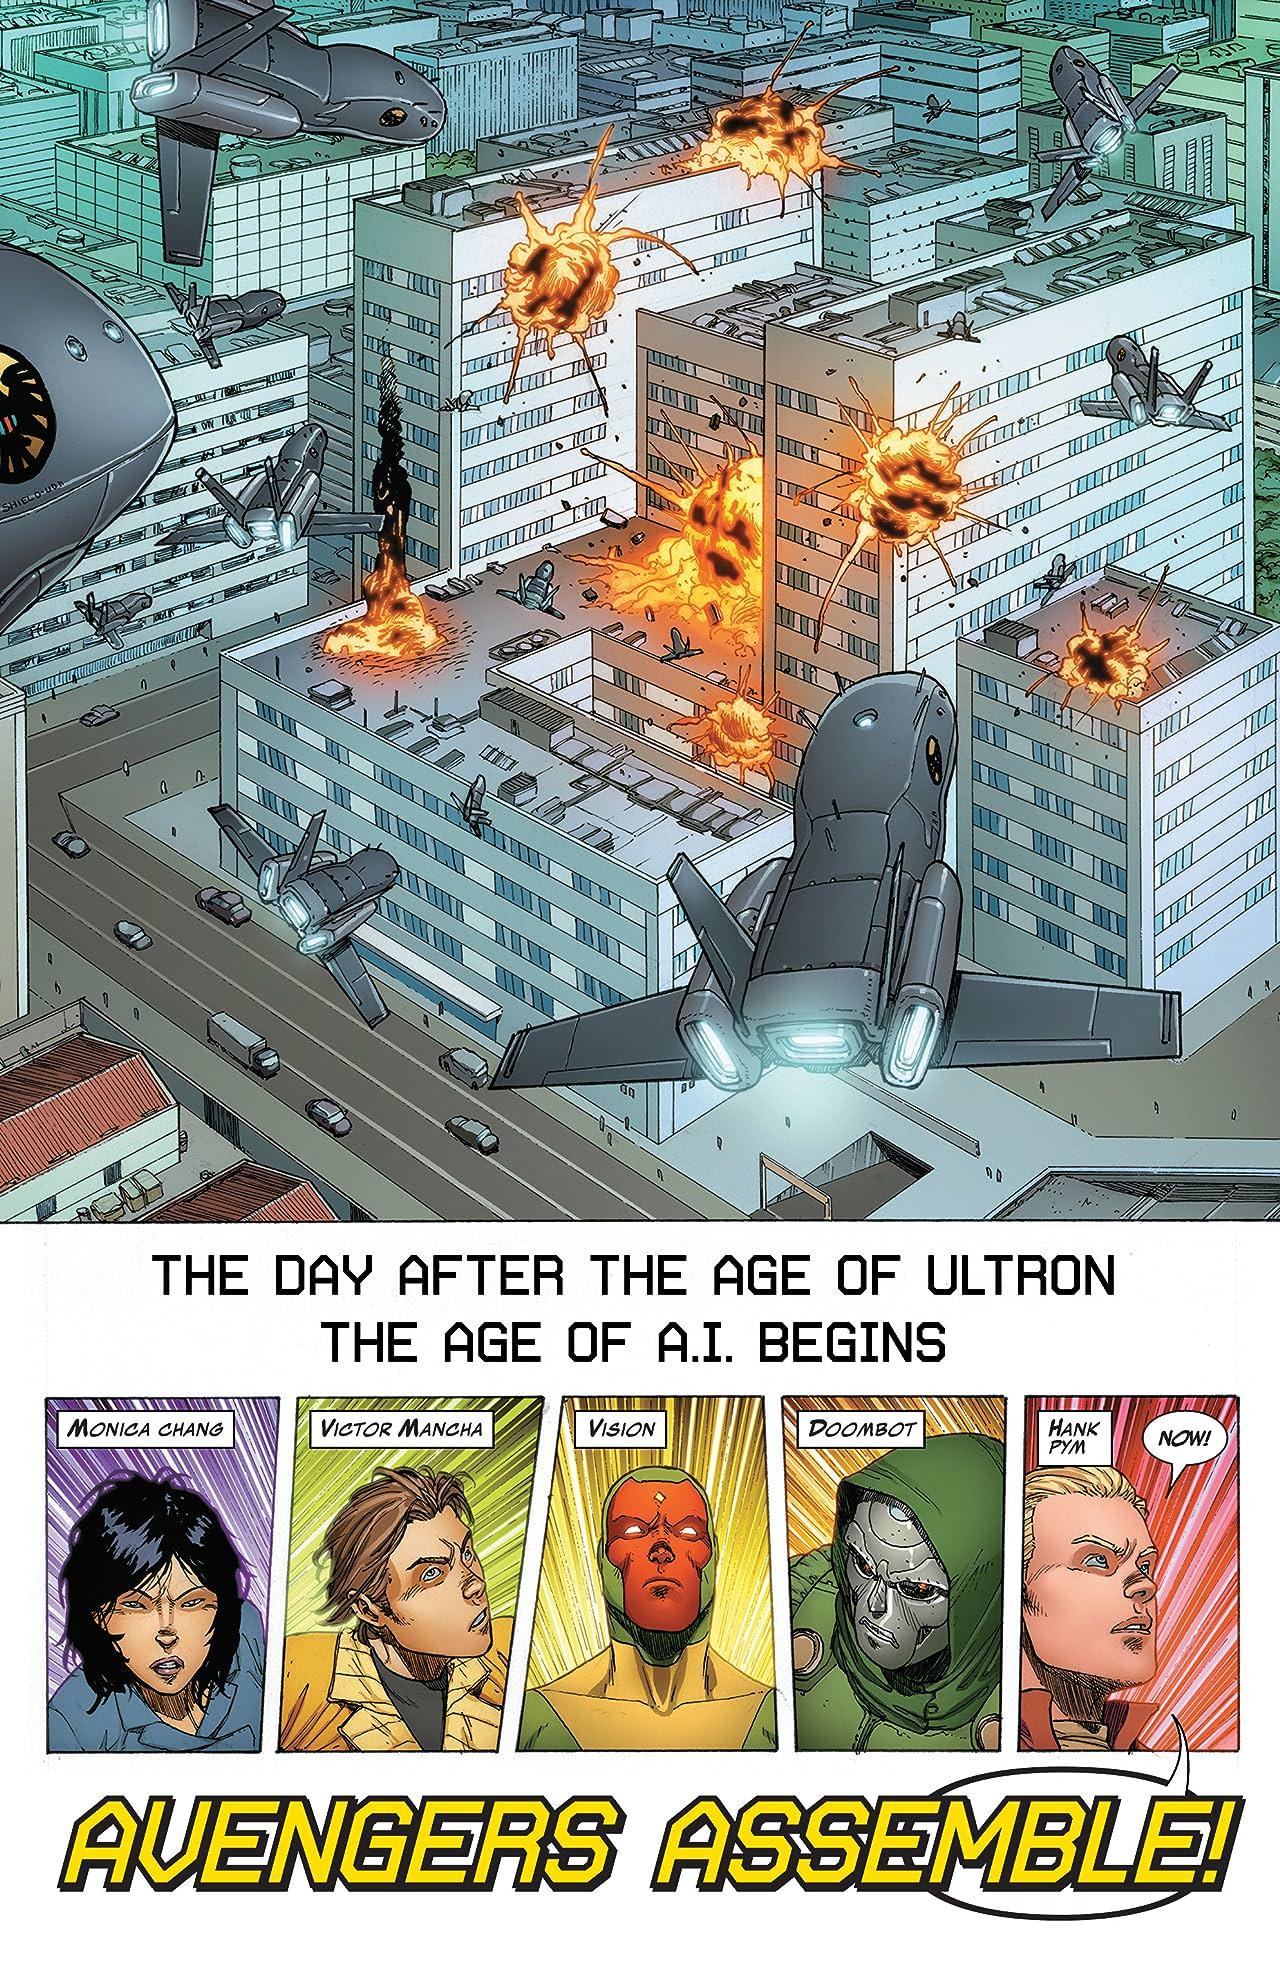 Avengers A.I. Vol. 1: Human After All